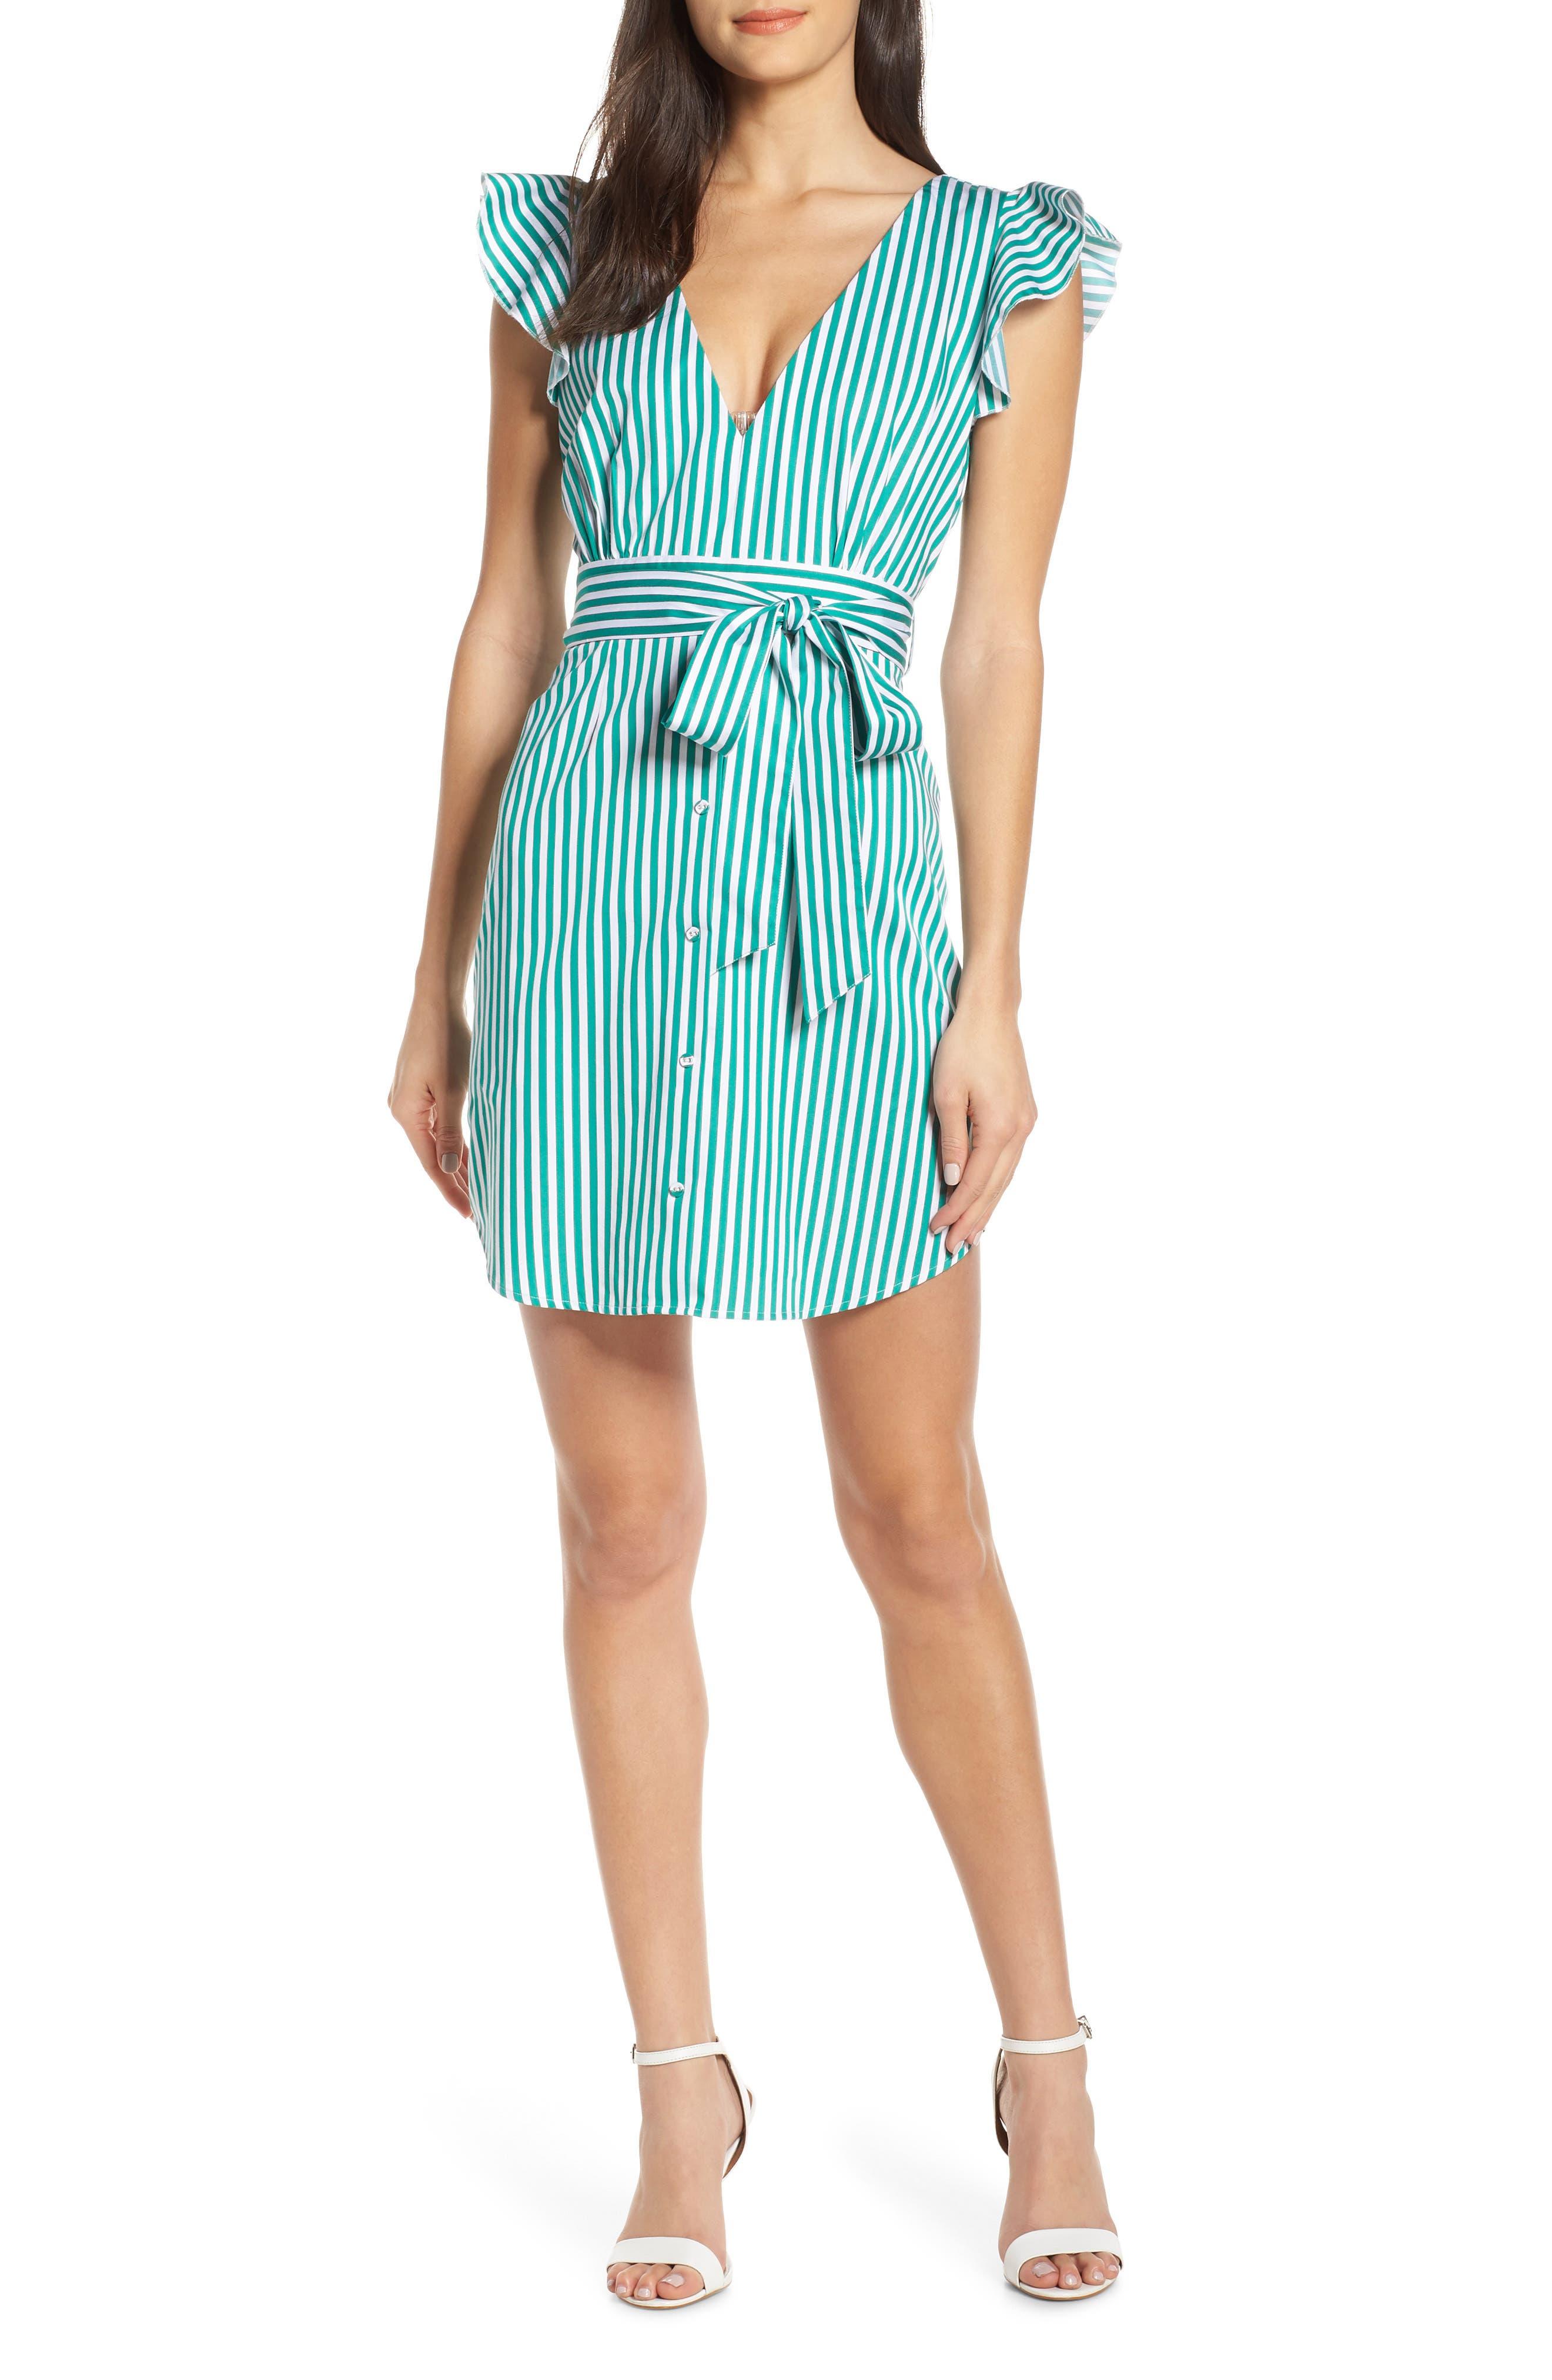 BB DAKOTA Peppermint Stripe Dress, Main, color, MISTY JADE